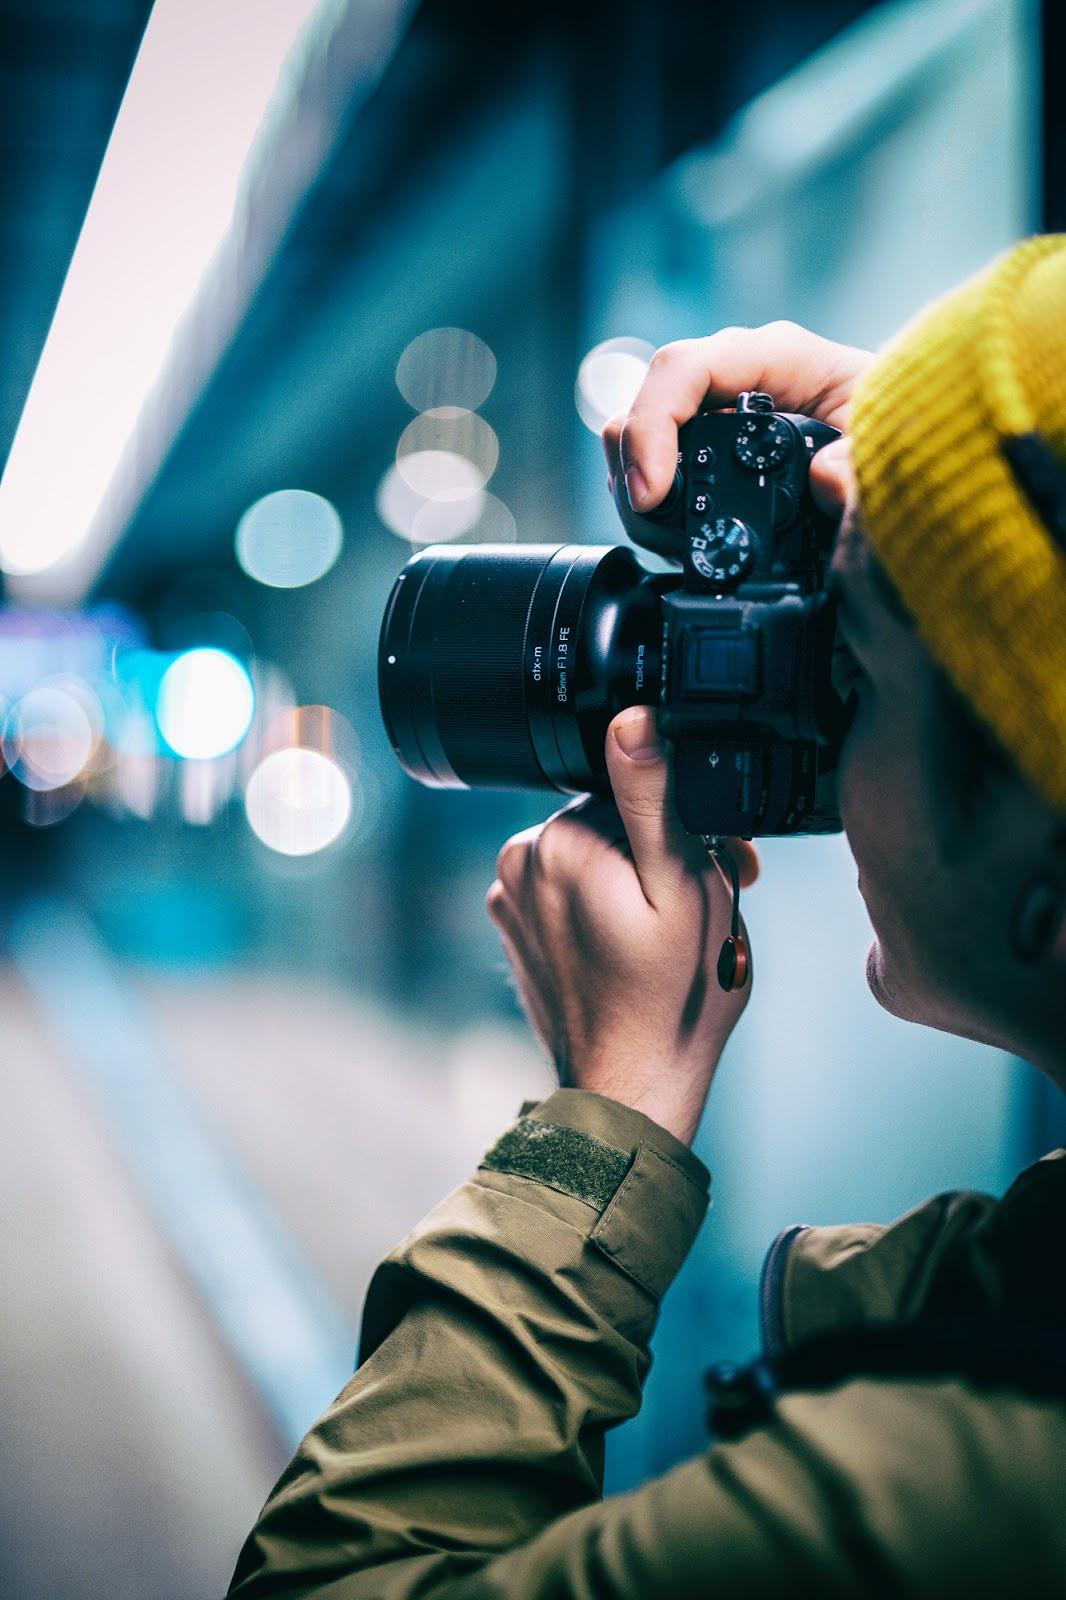 Объектив Tokina ATX-M 85mm f/1.8 FE с камерой Sony в руках фотографа